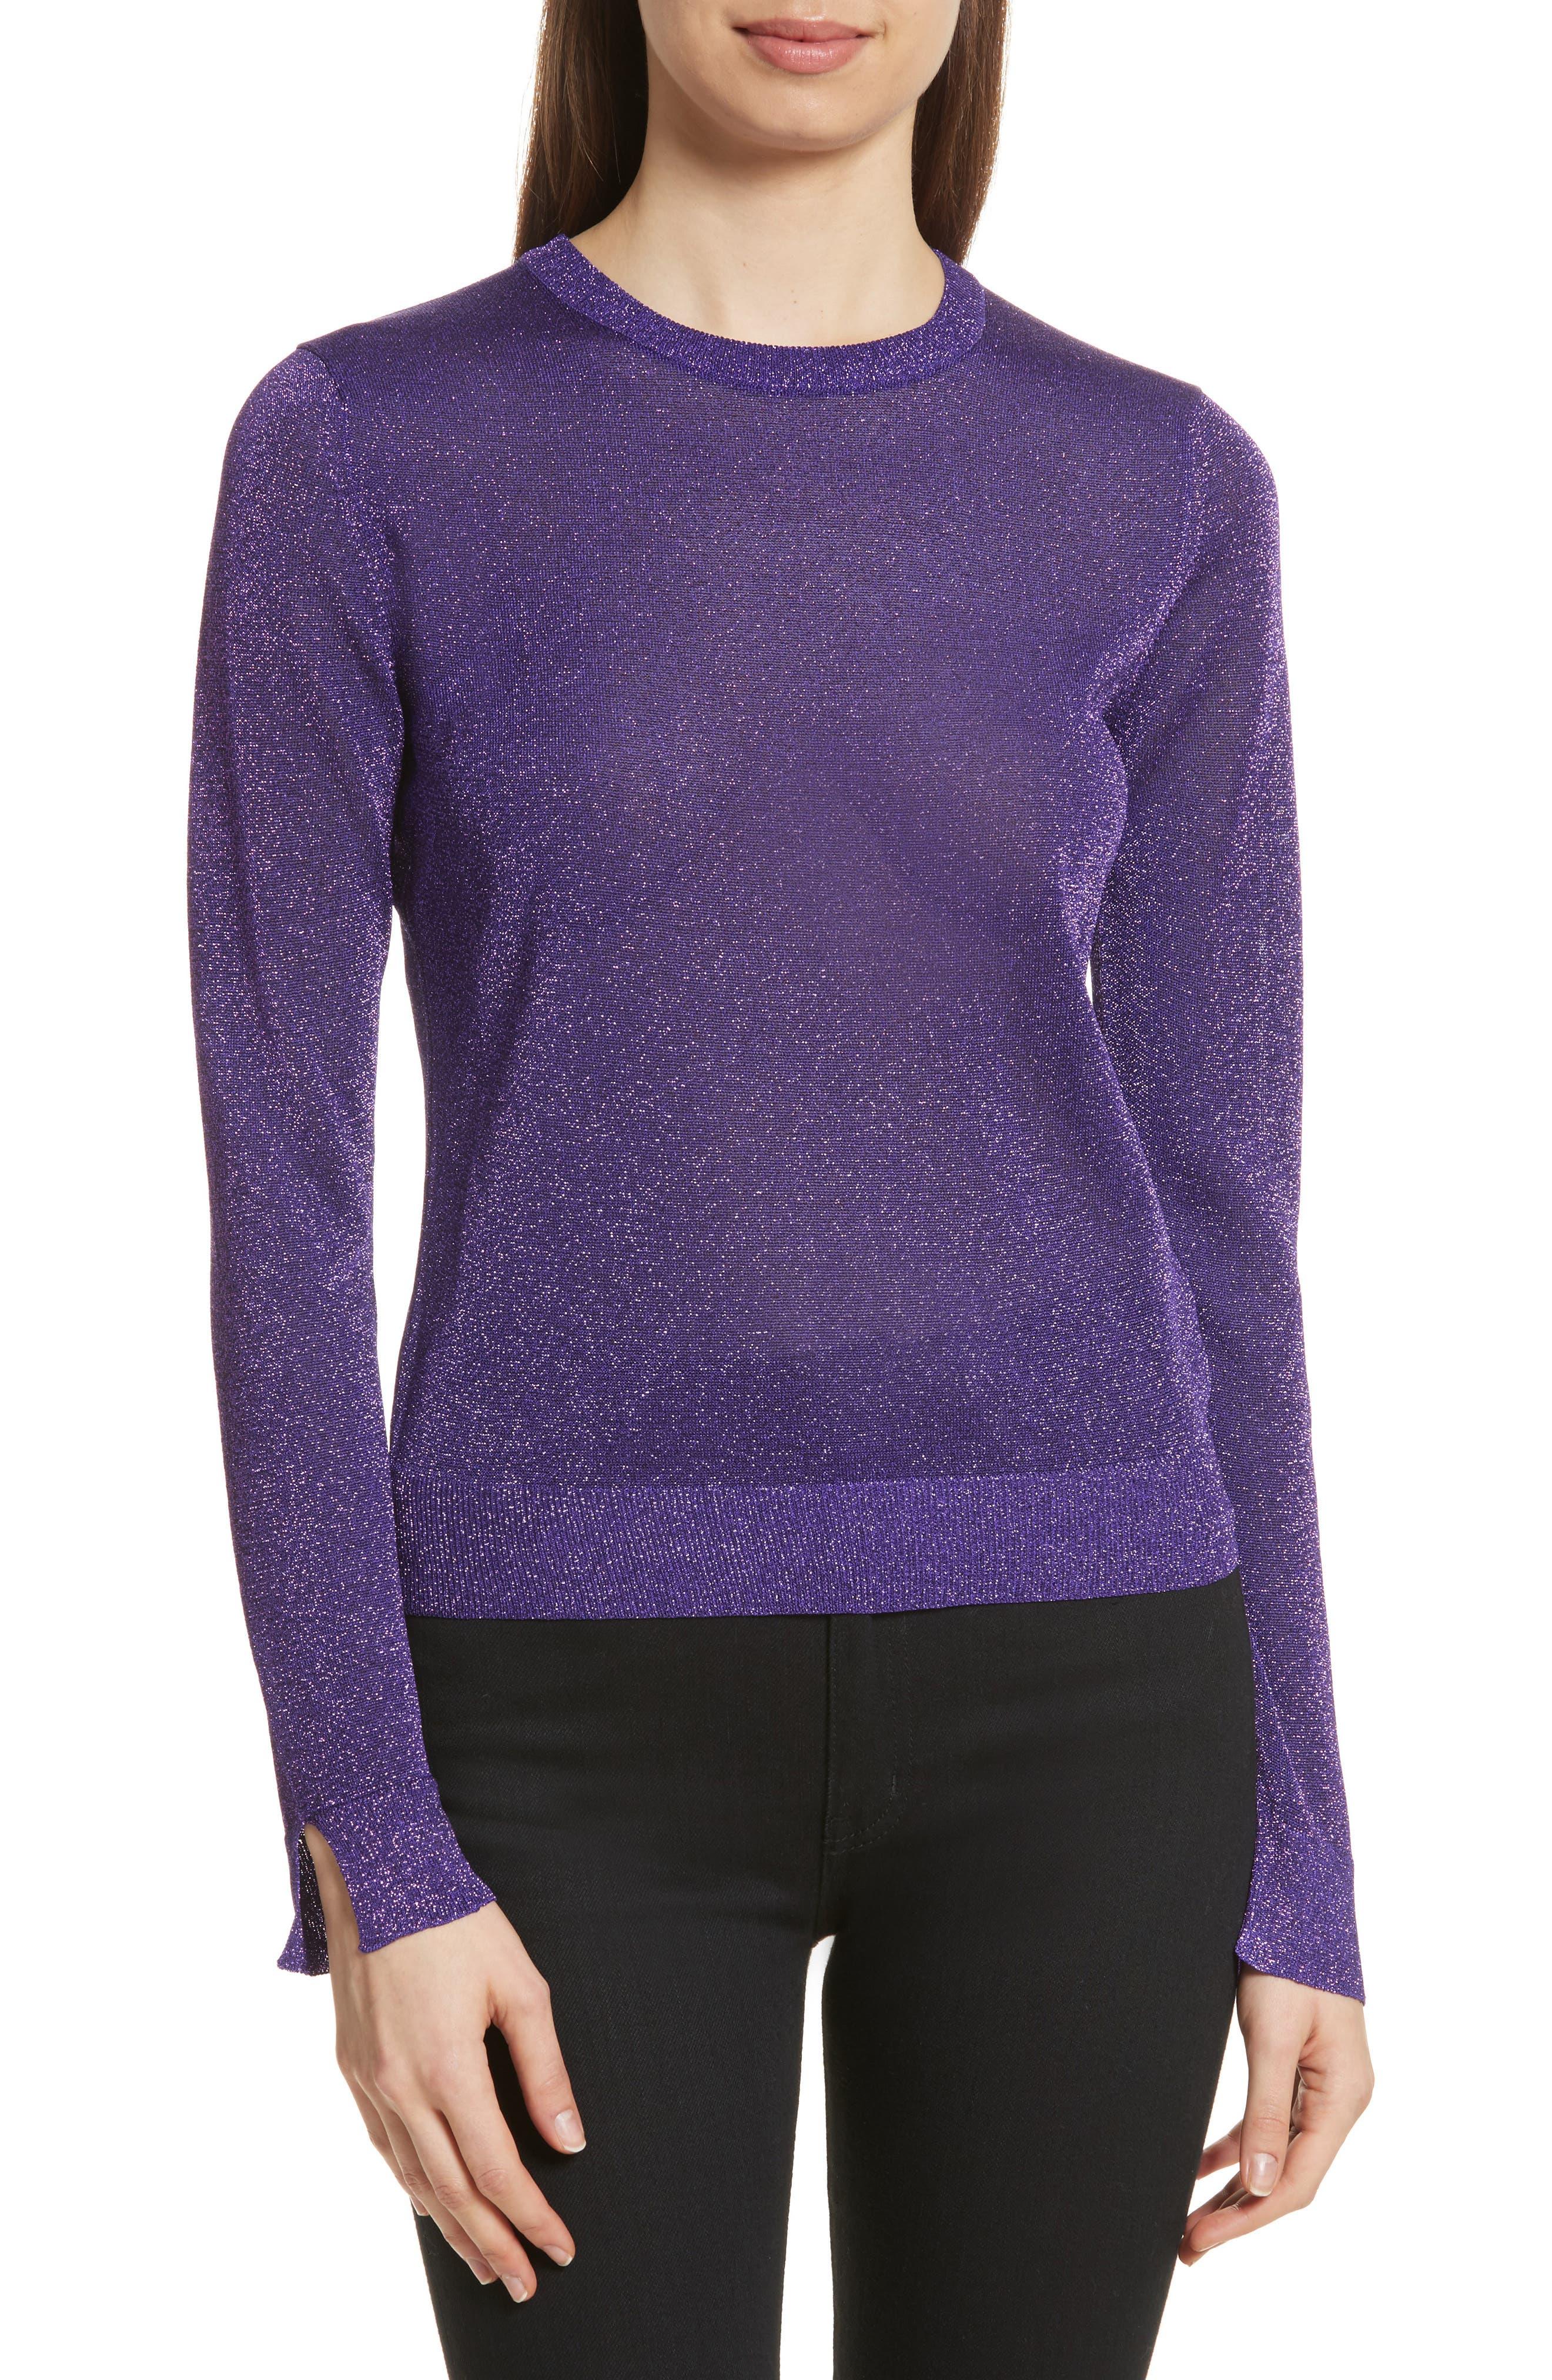 KENZO Metallic Knit Sweater